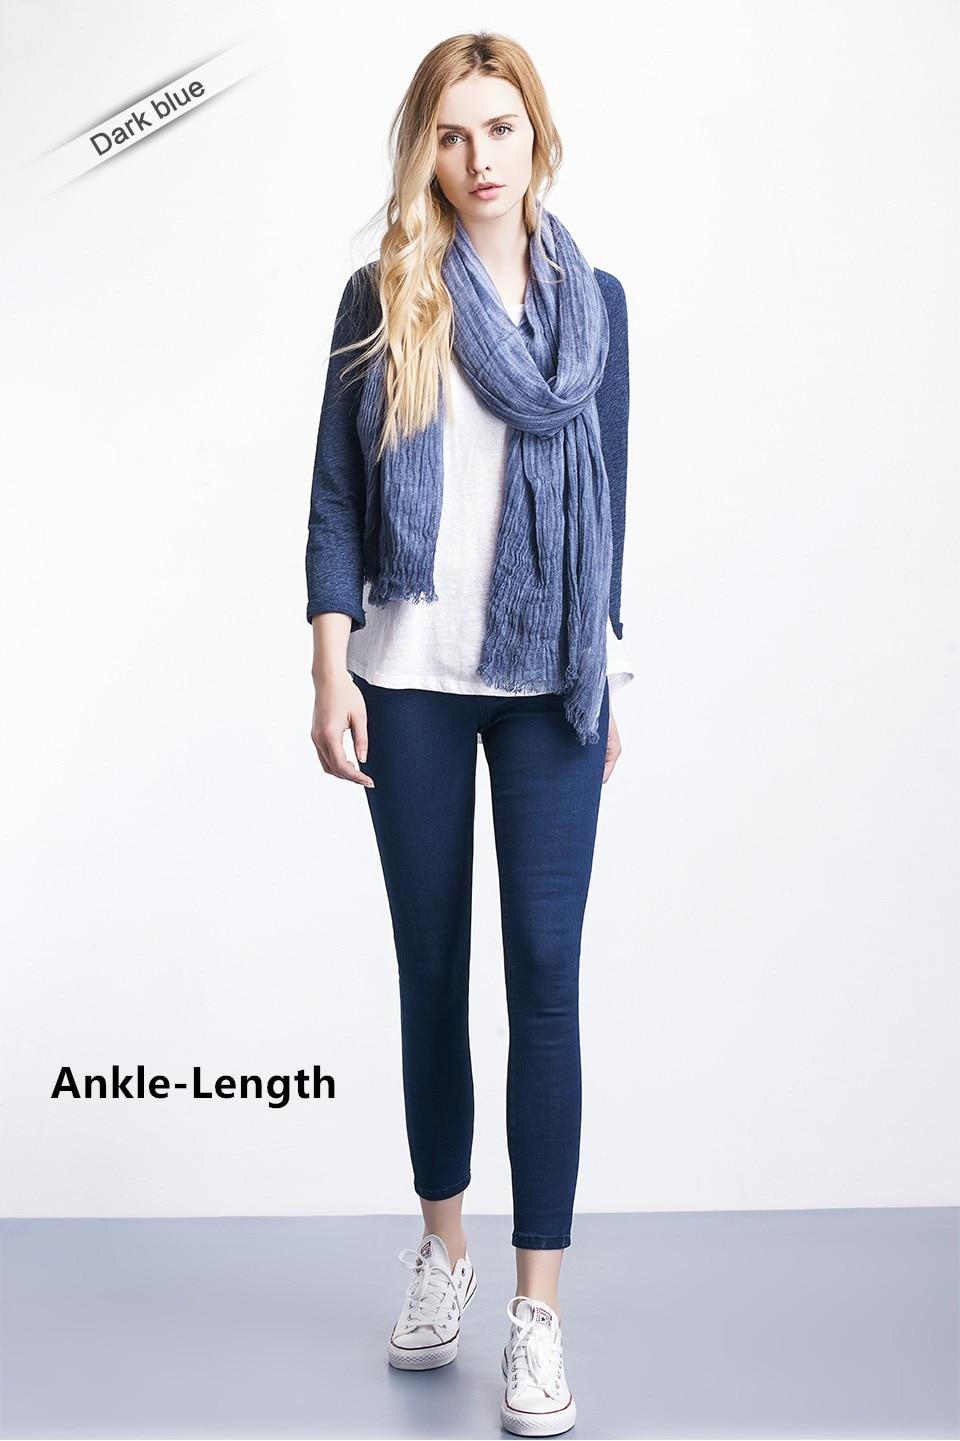 Women Jeans Plus Size Casual high waist summer Autumn Pant Slim Stretch Cotton Denim Trousers for woman Blue black 4xl 5xl 6xl 3